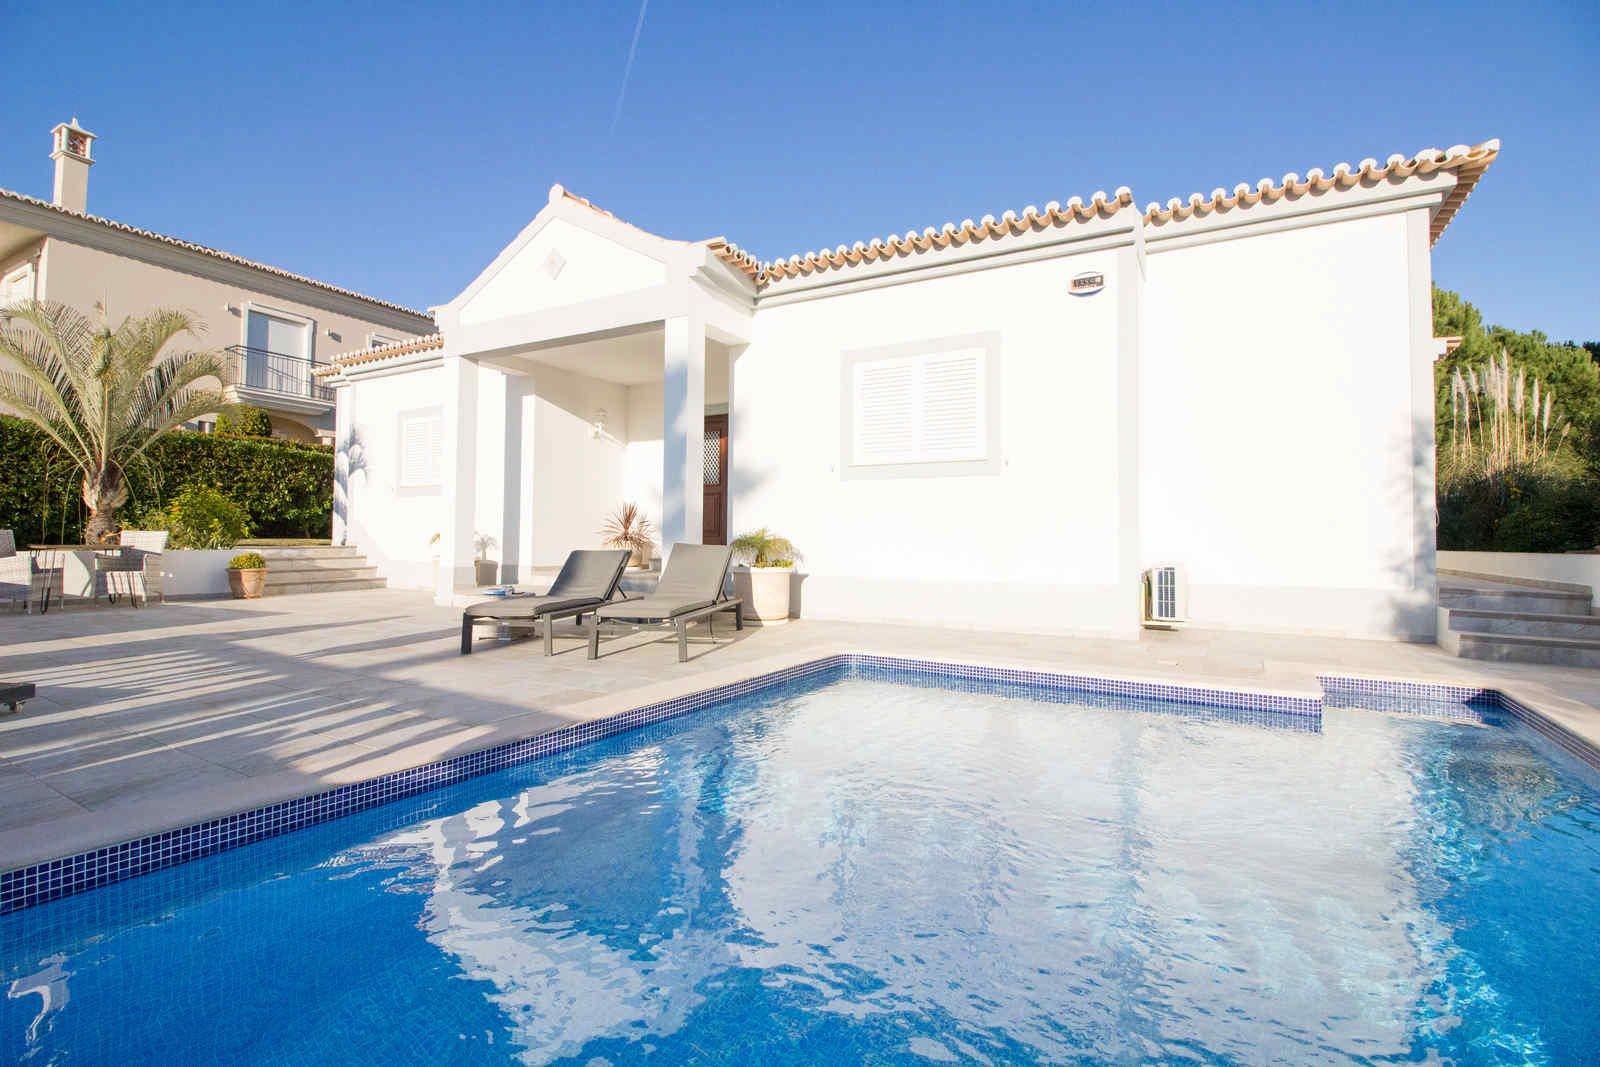 4 Bedroom Villa Almancil, Central Algarve Ref: PV3466